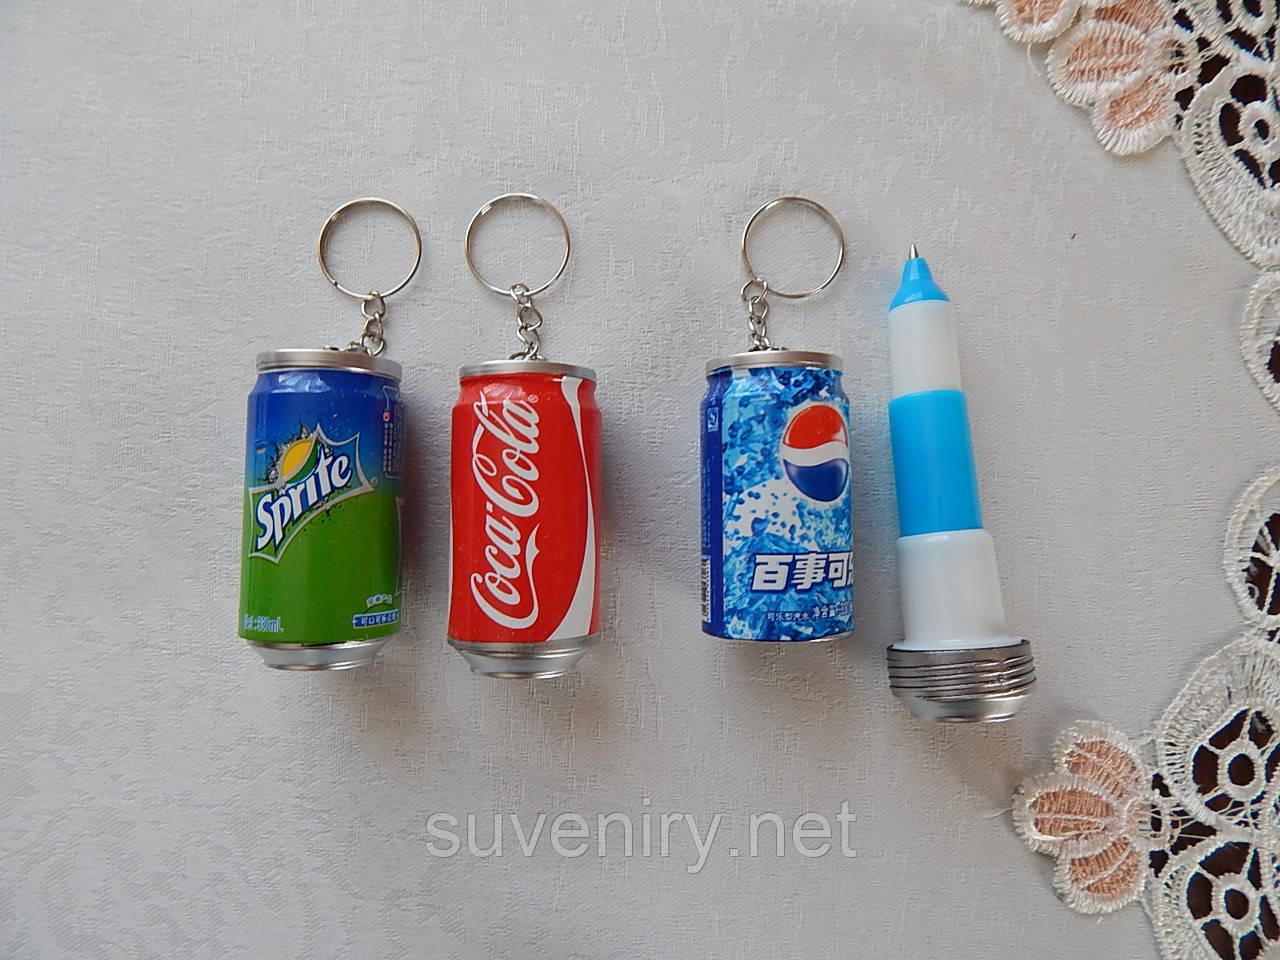 Брелок на ключи с ручкой